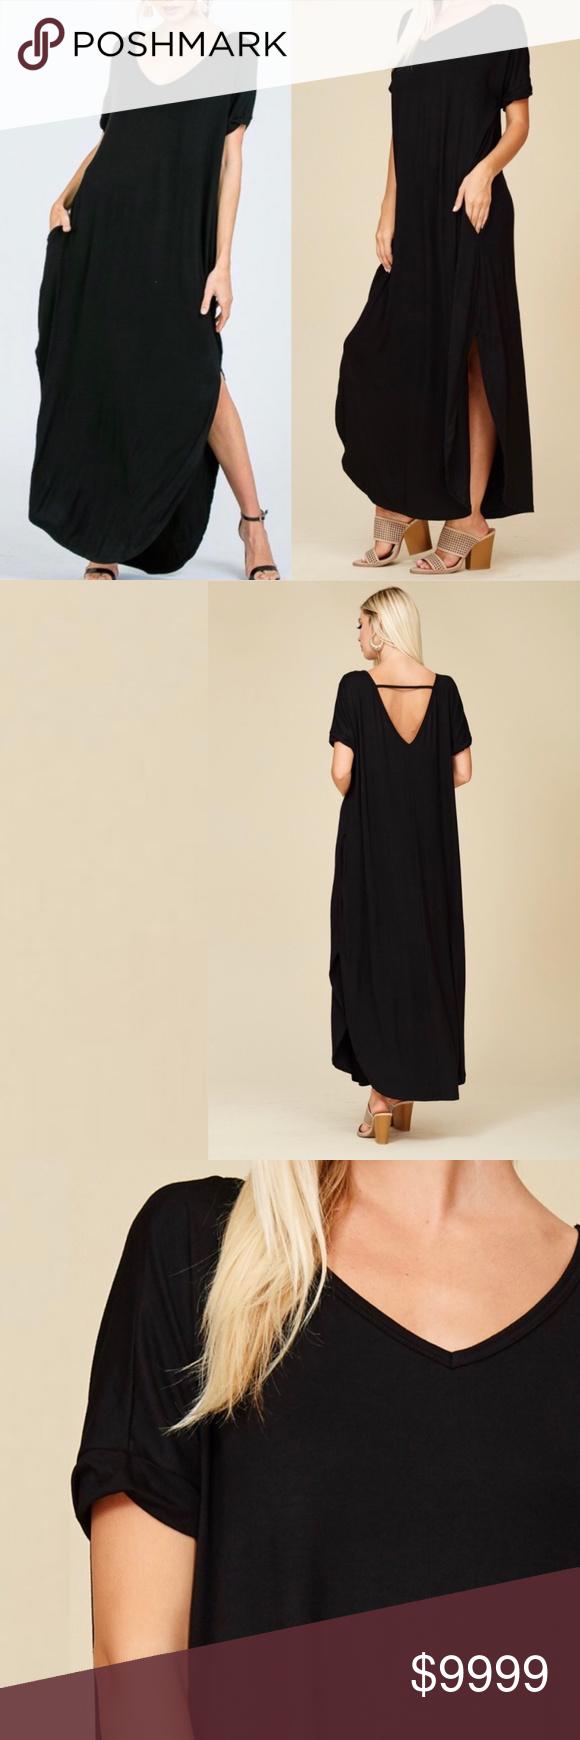 Black Maxi Dress Pockets Oversized T Shirt Dress Black Maxi Dress Comfy Dresses Maxi Dress [ 1740 x 580 Pixel ]